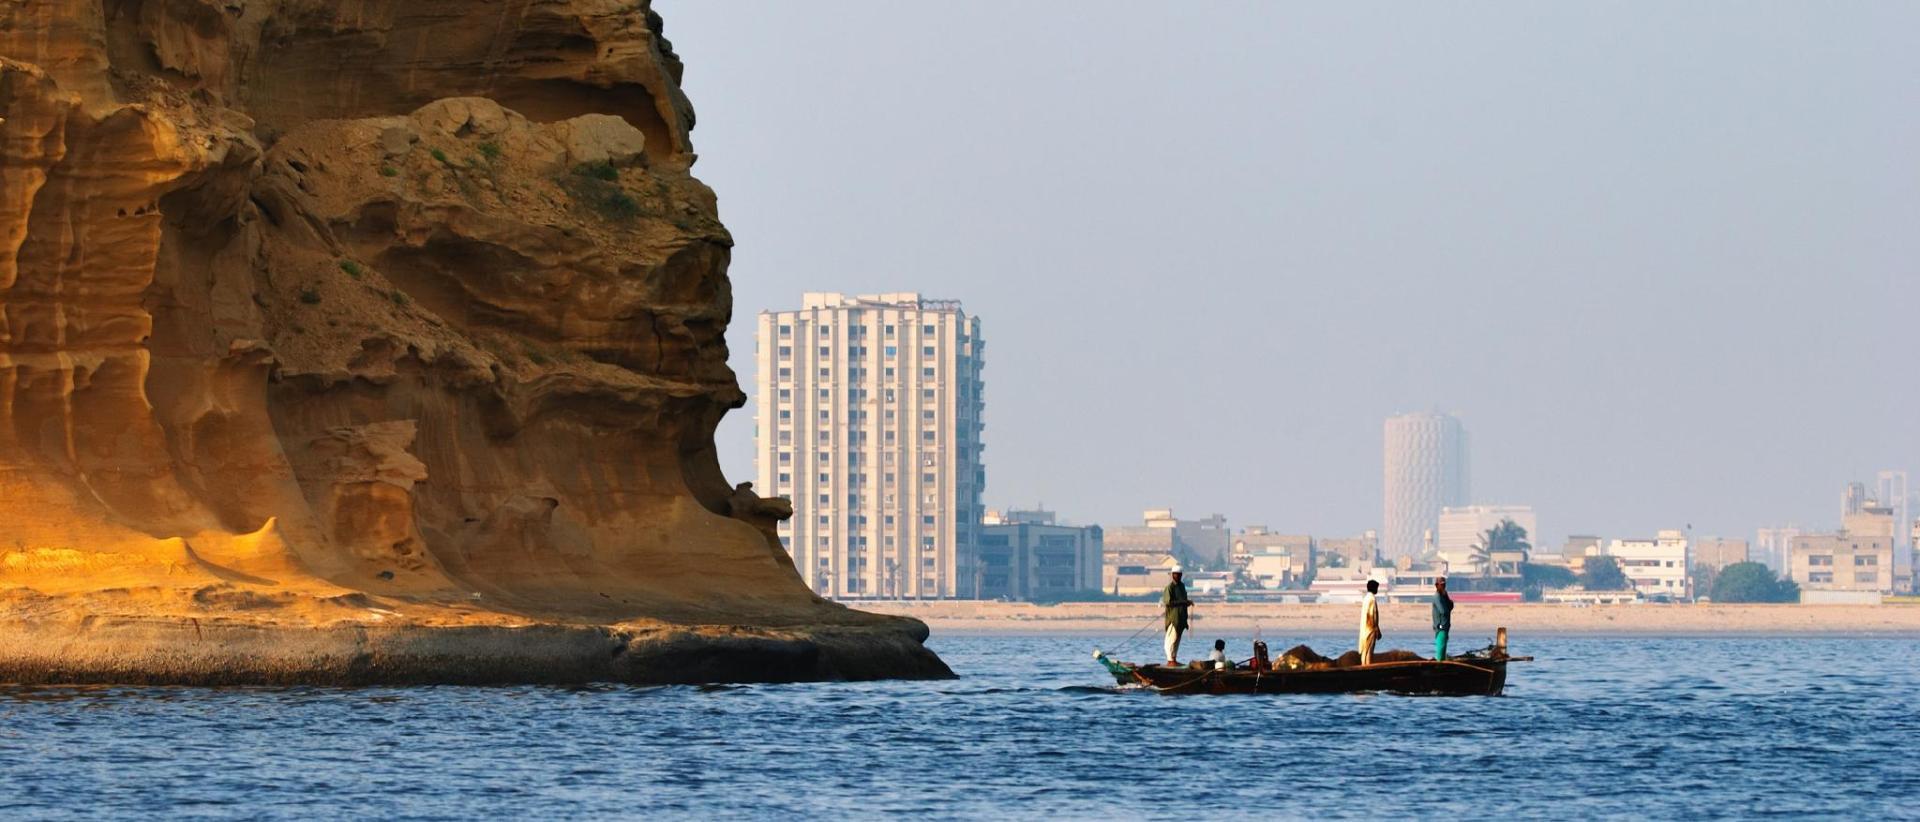 Hotels near Aga Khan University Hospital, Karachi - BEST